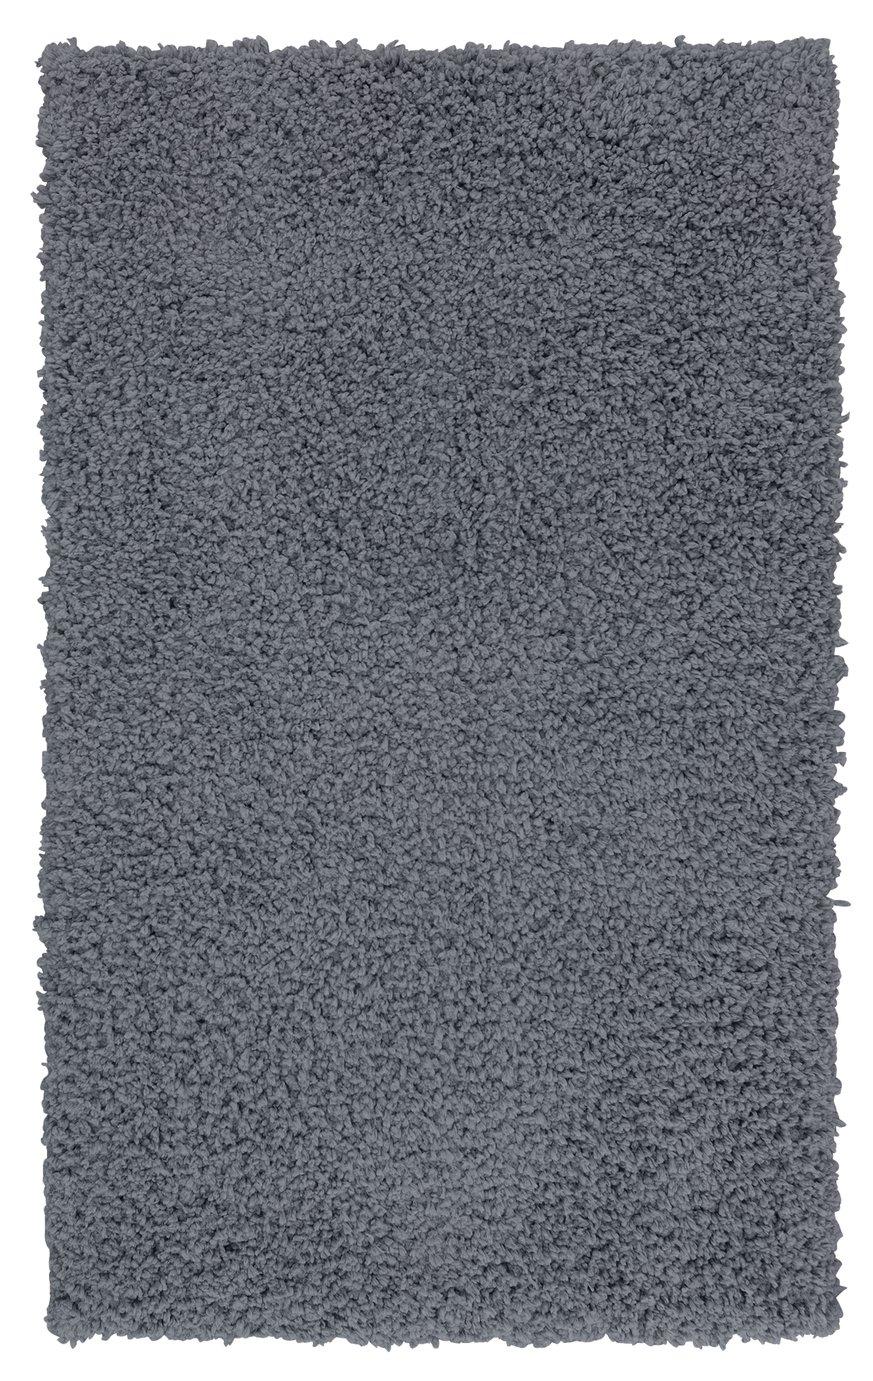 Argos Home Cosy Runner 60x110- Flint Grey